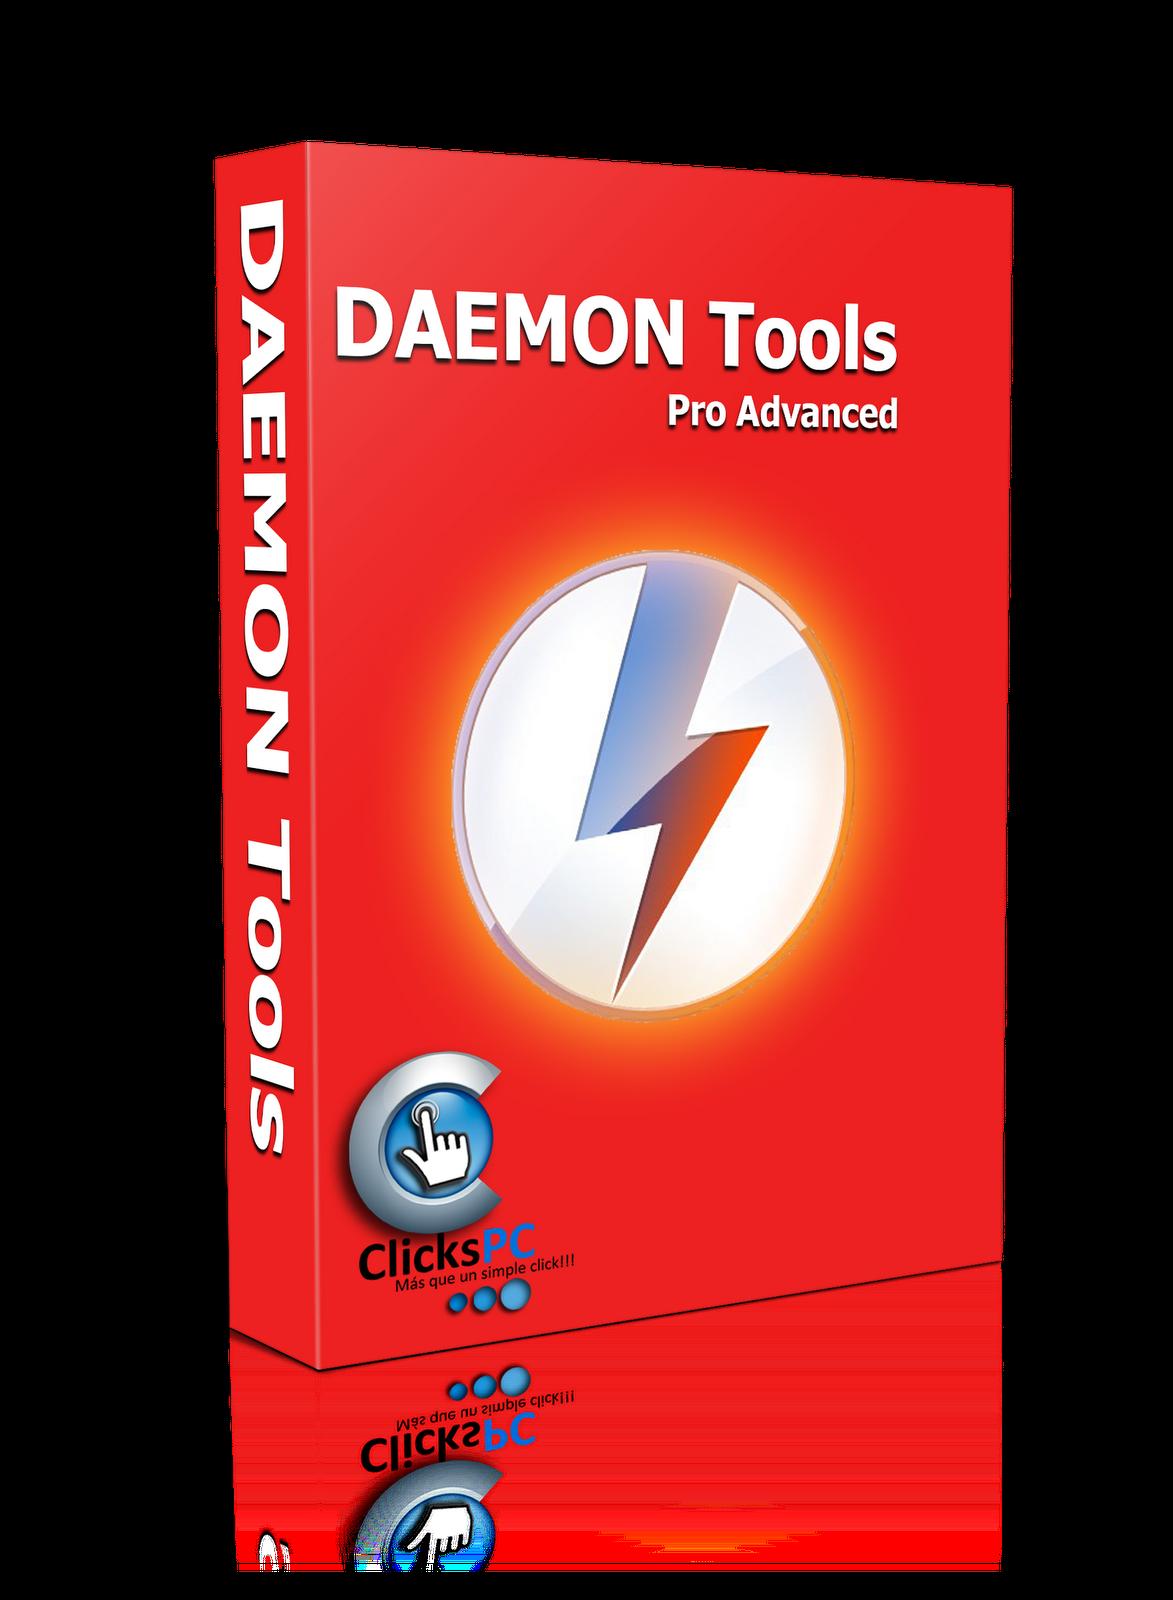 Daemon tools pro advanced v5 2 0 0348 including crack for Daemon tools